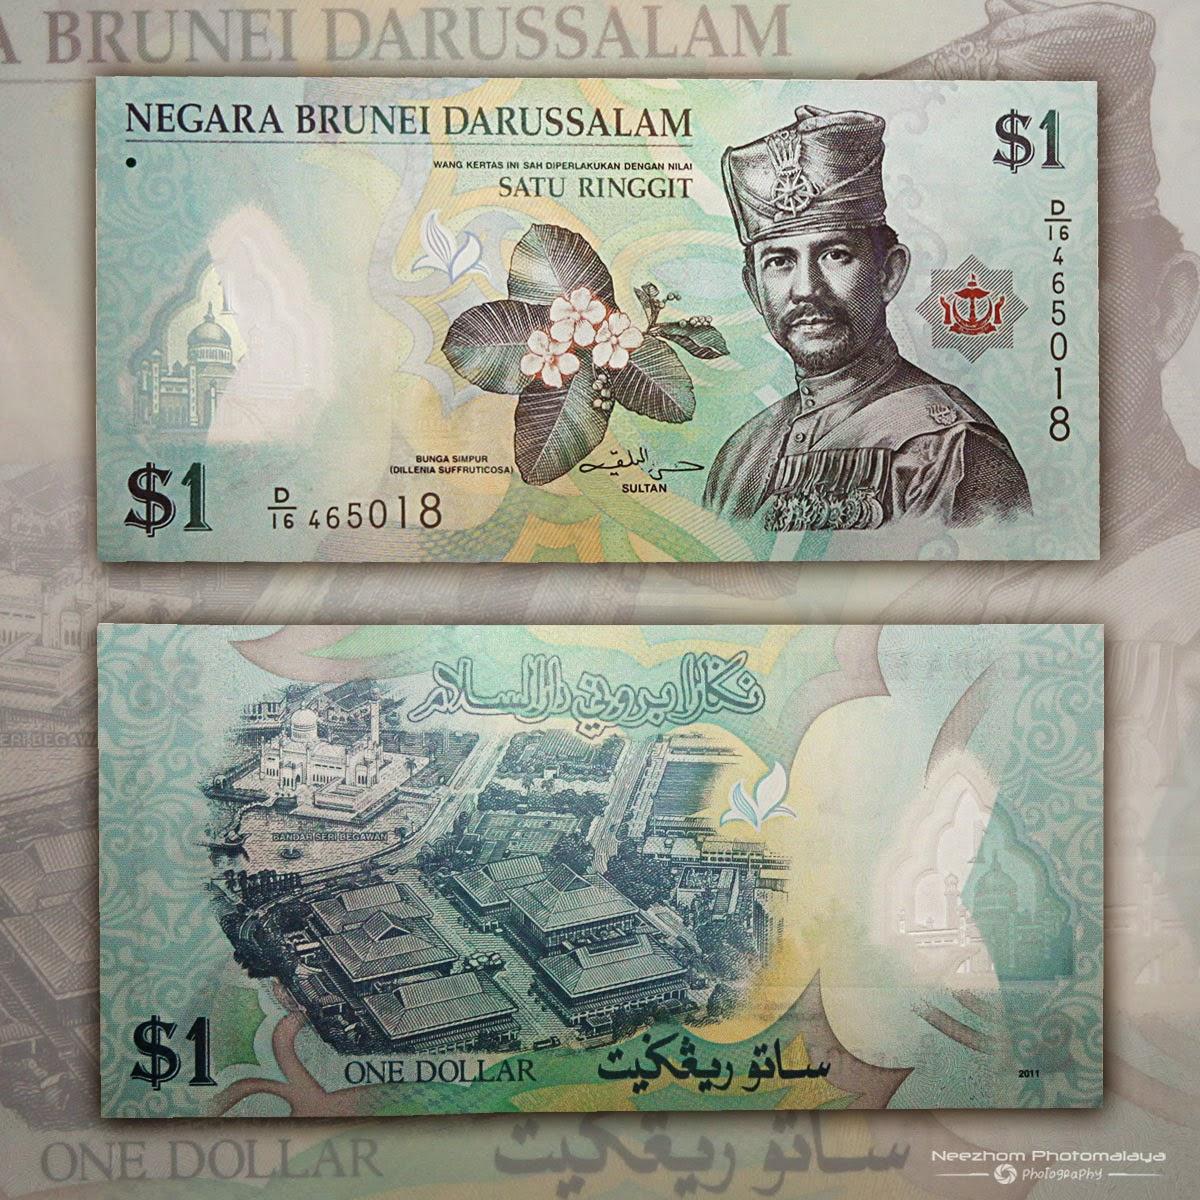 Brunei 1 Dollar 2011 polymer banknote